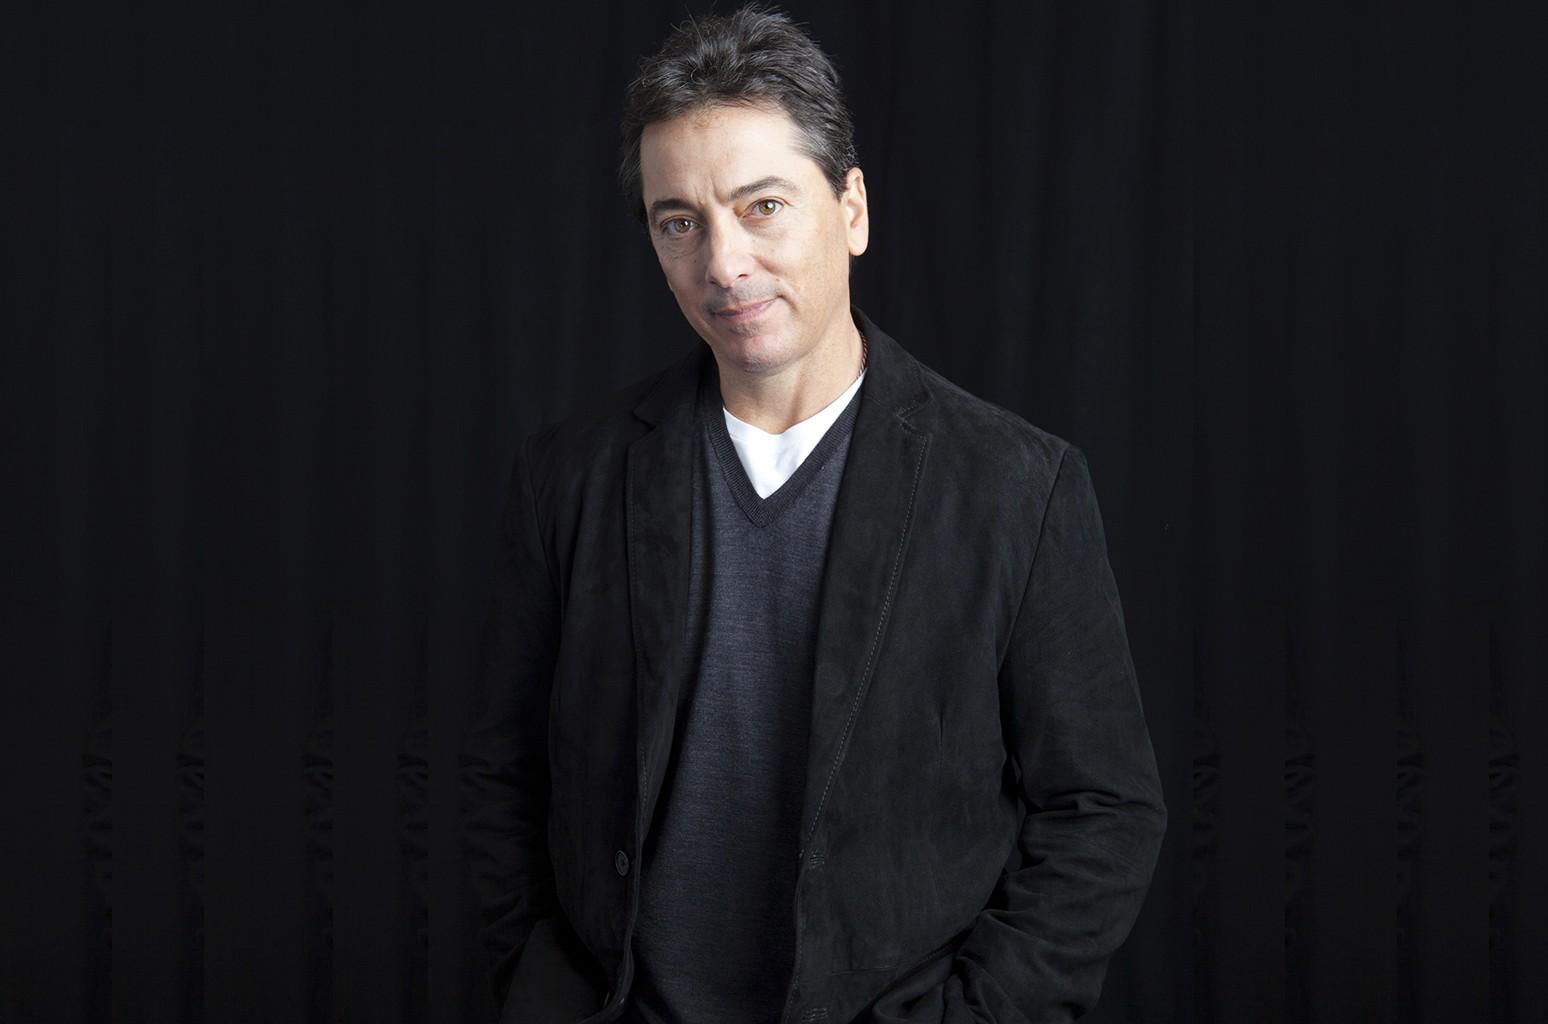 Scott Baio photographed in New York City.